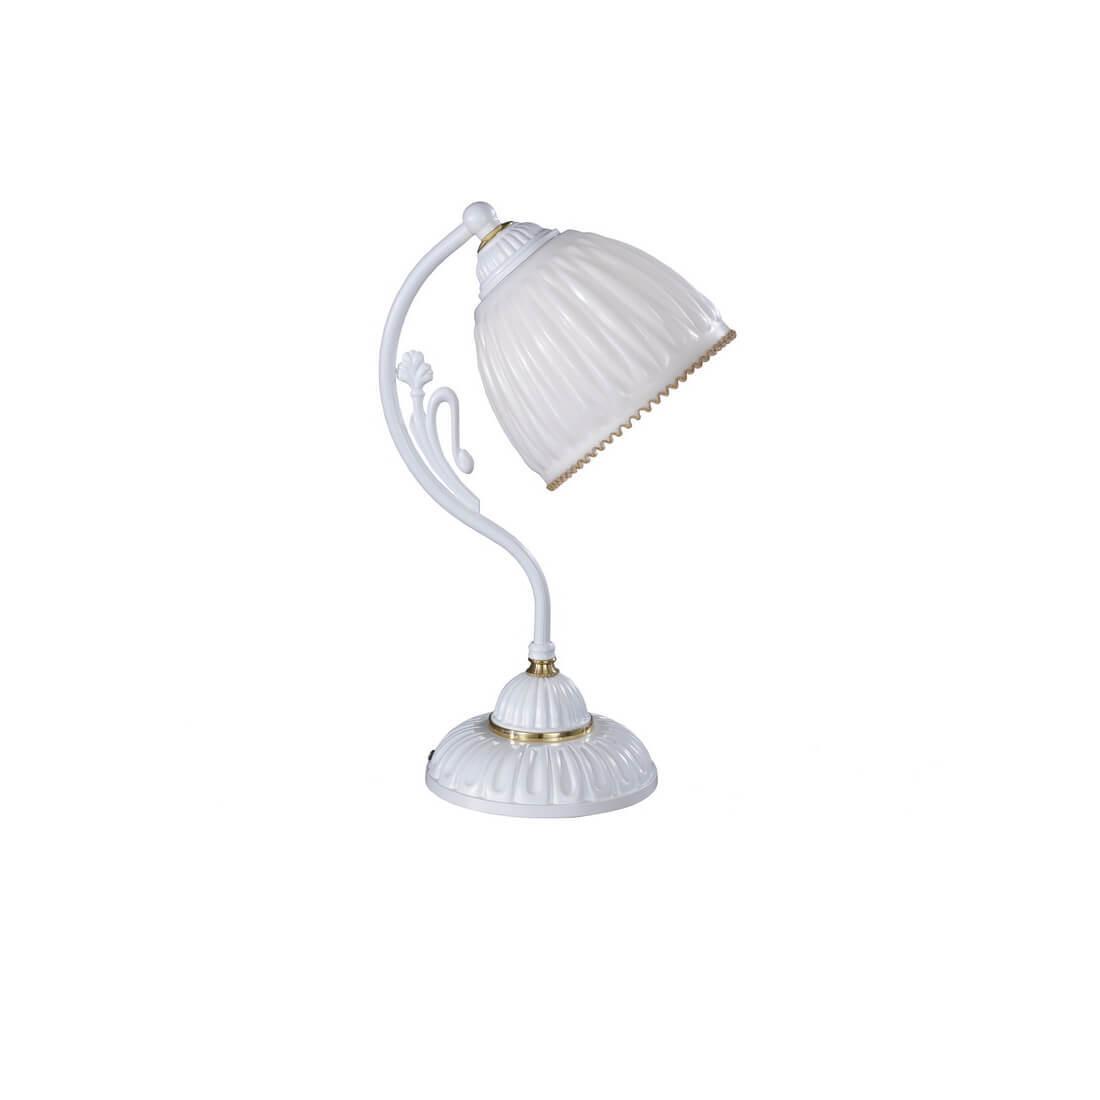 Настольная лампа Reccagni Angelo P 9601 люстра reccagni angelo 9601 pl 9601 3